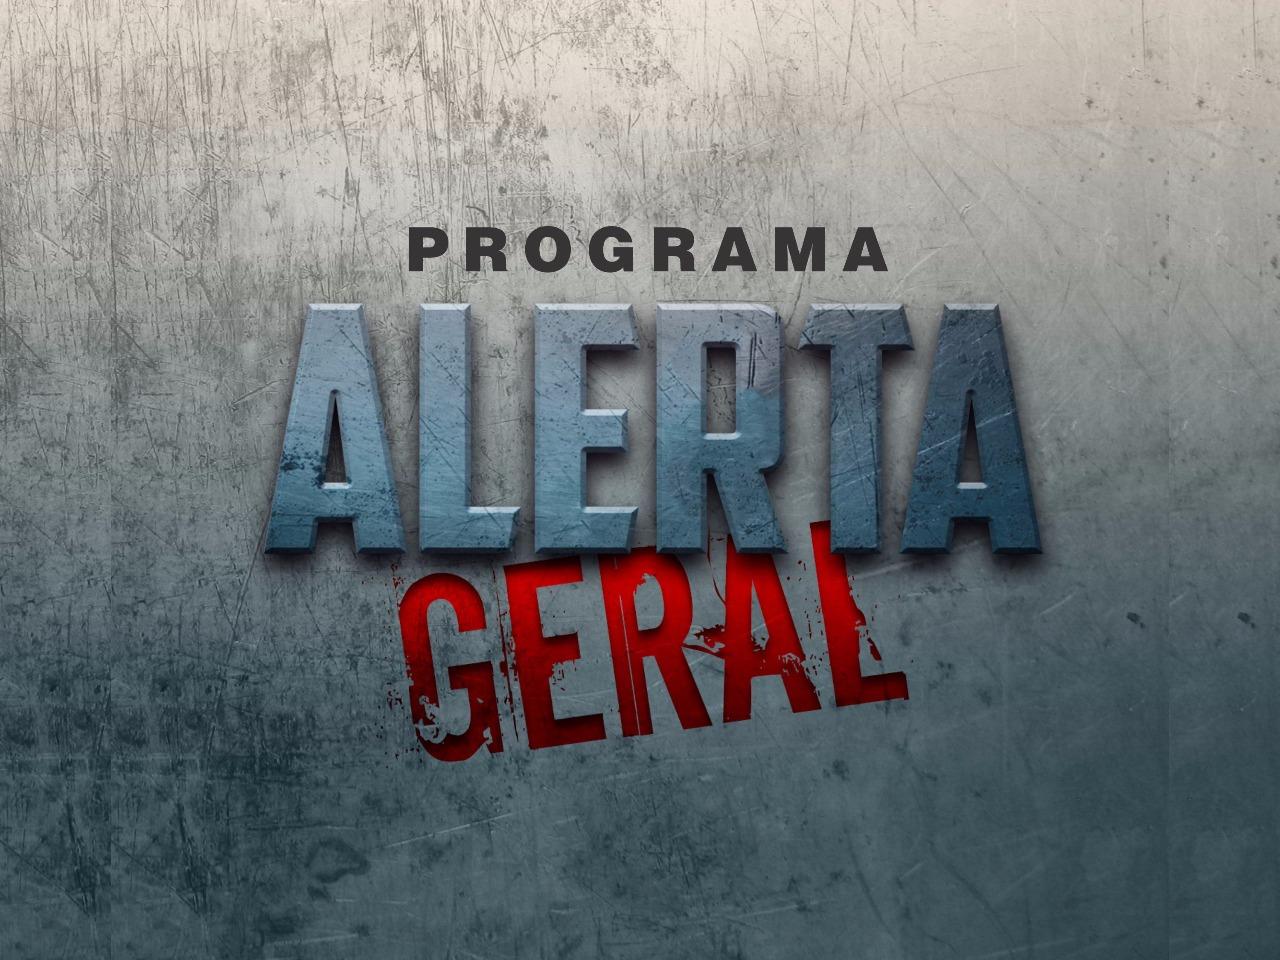 PROGRAMA ALERTA GERAL